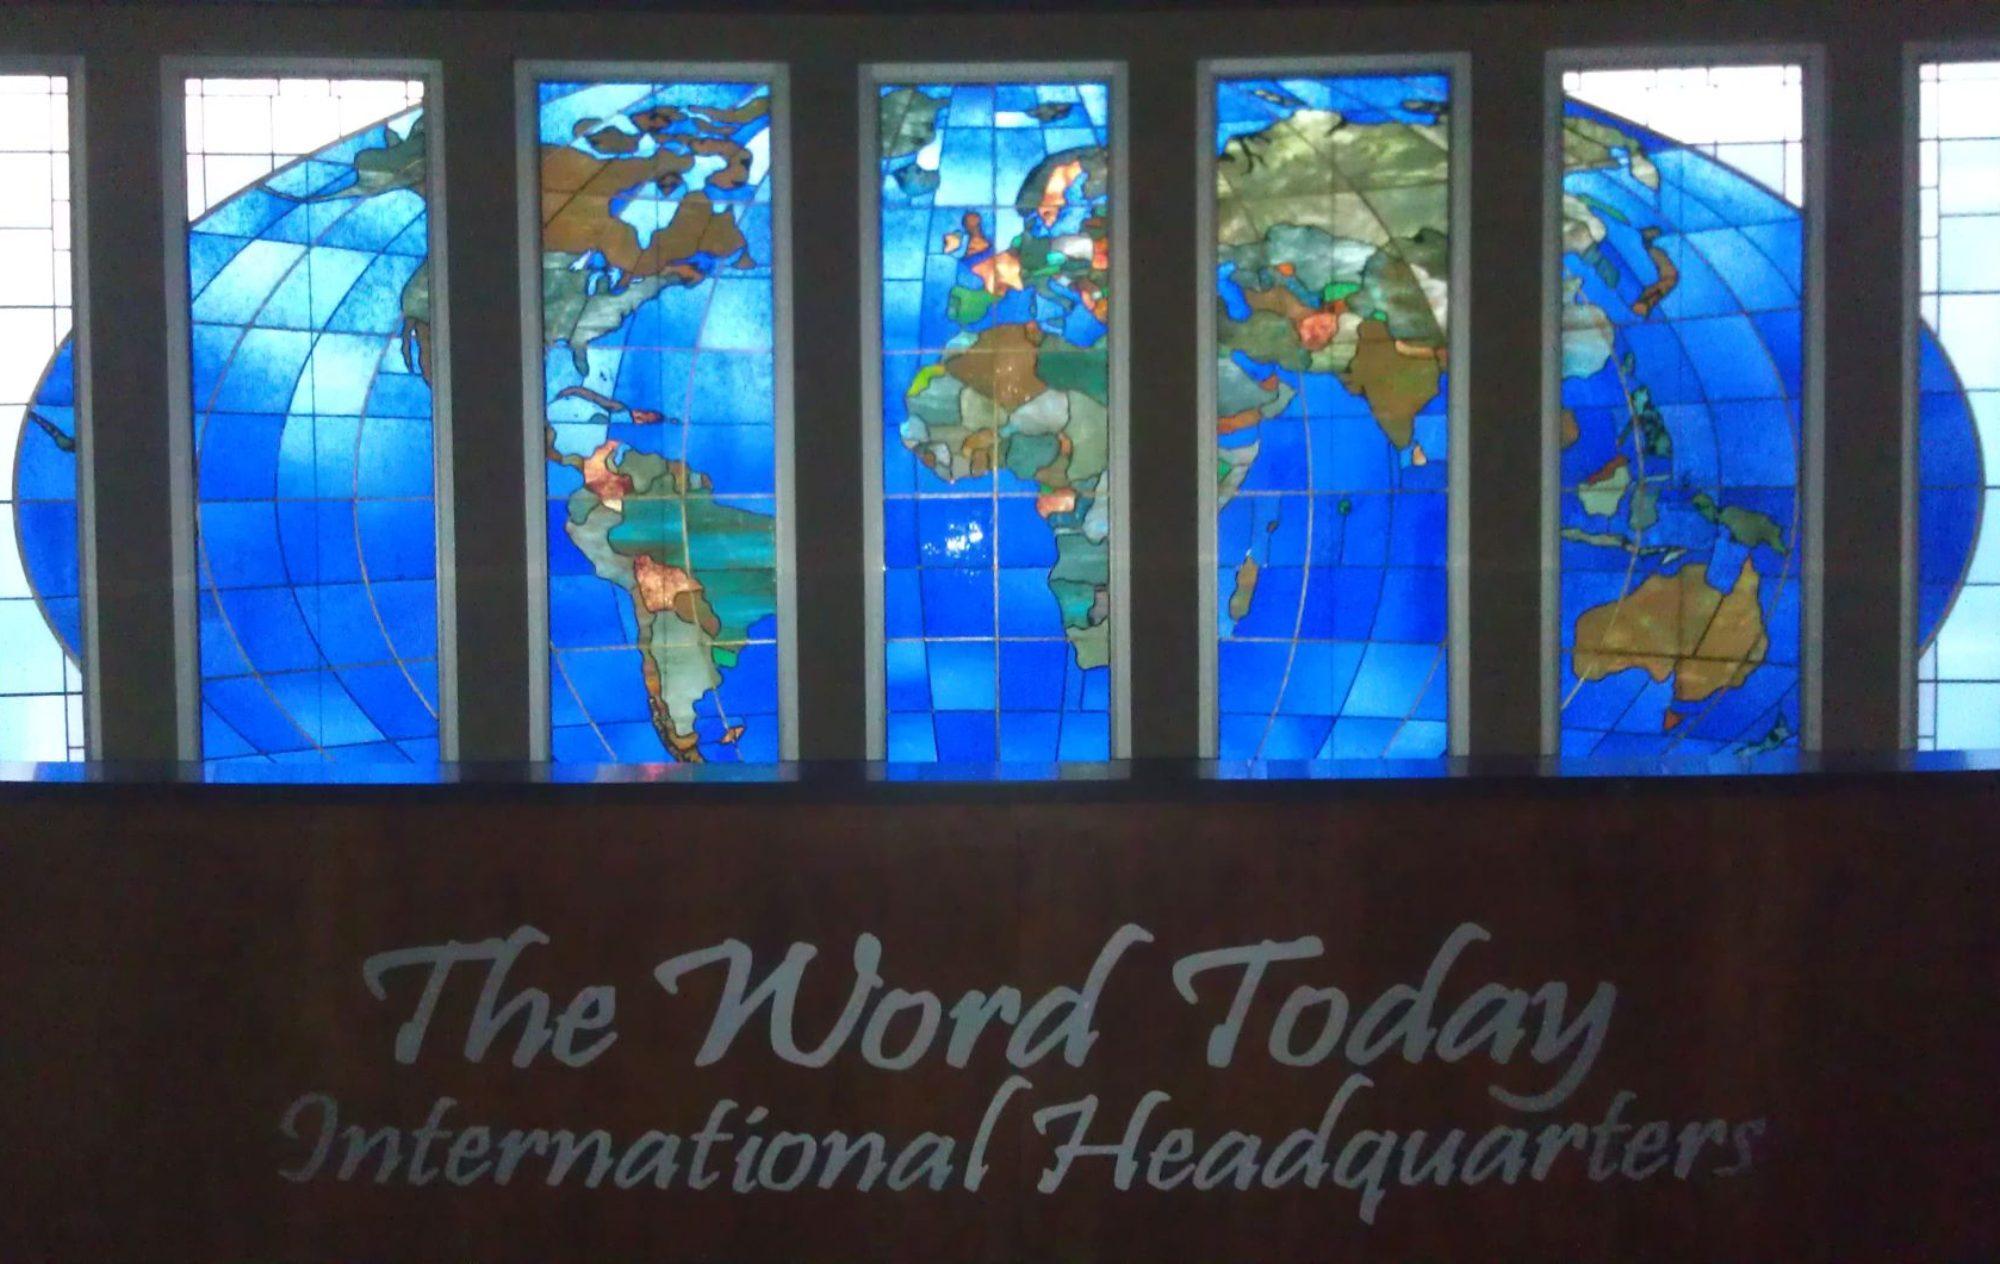 Our Shepherd Lutheran Church